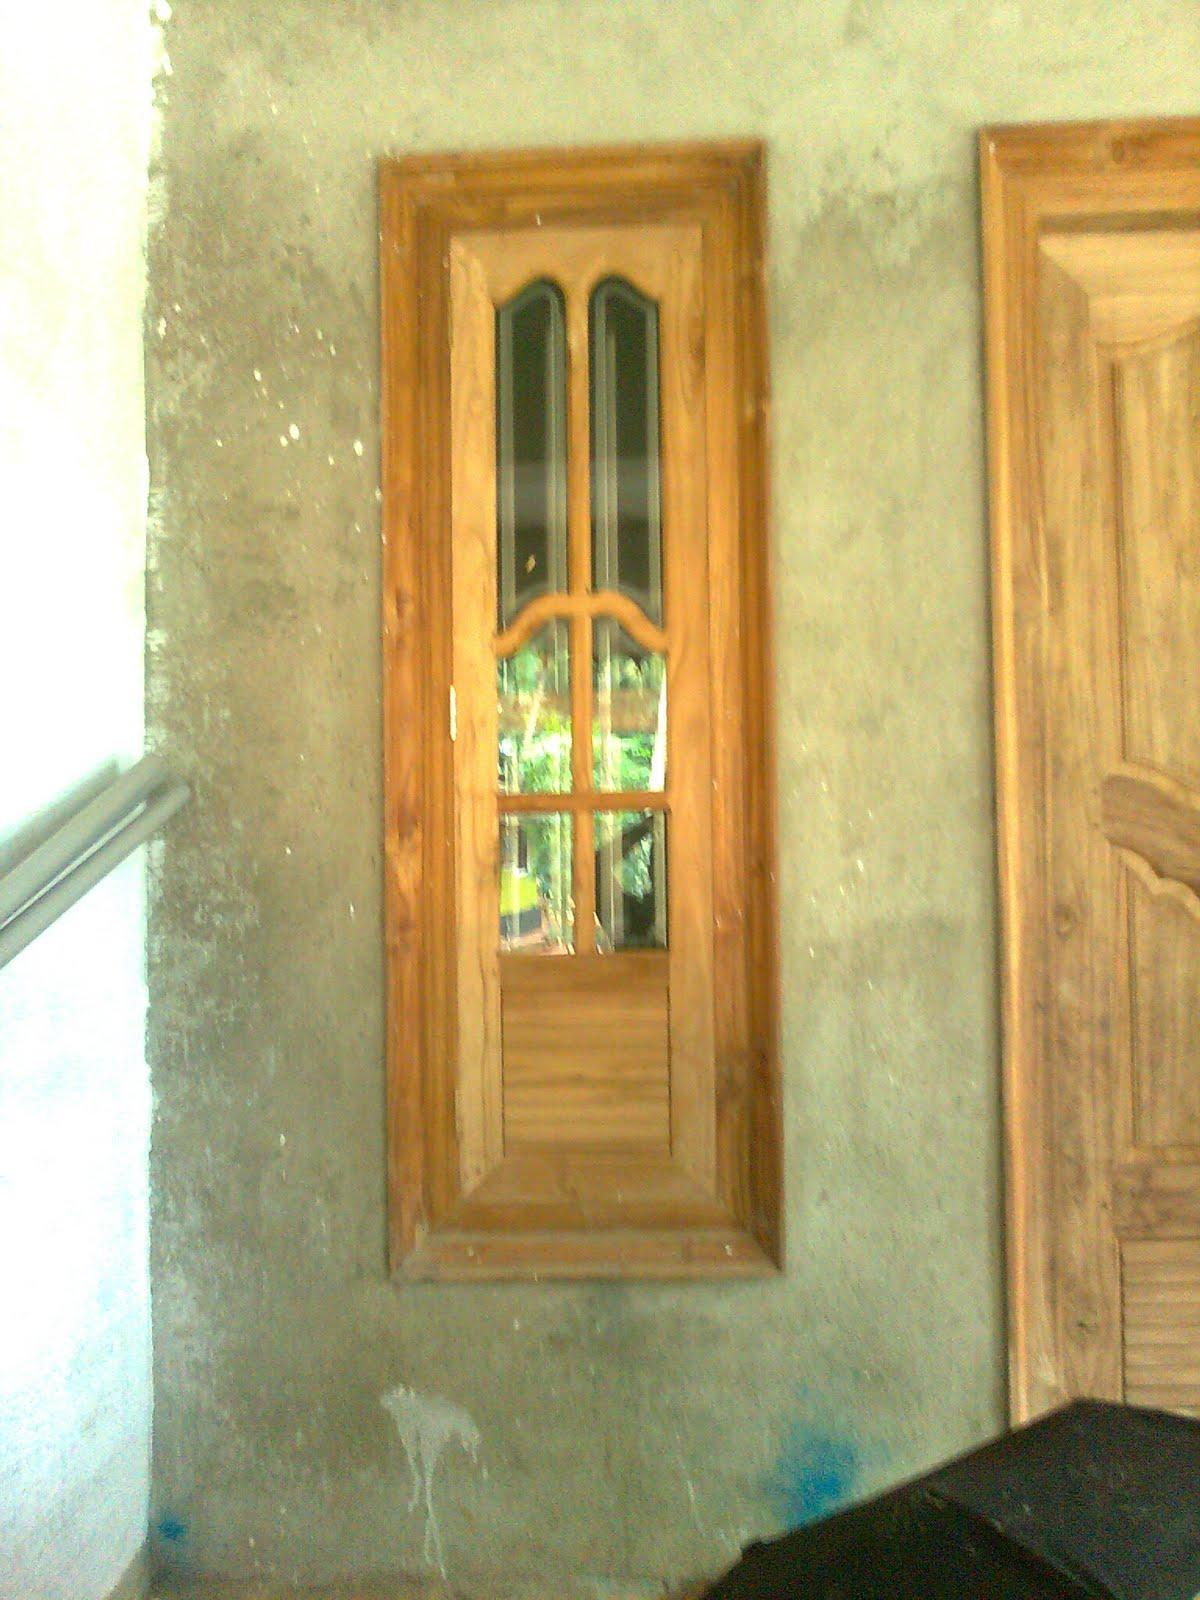 Bavas Wood Works Pooja Room Door Frame And Door Designs: BAVAS WOOD WORKS: Wooden Window Doors Simple Designs